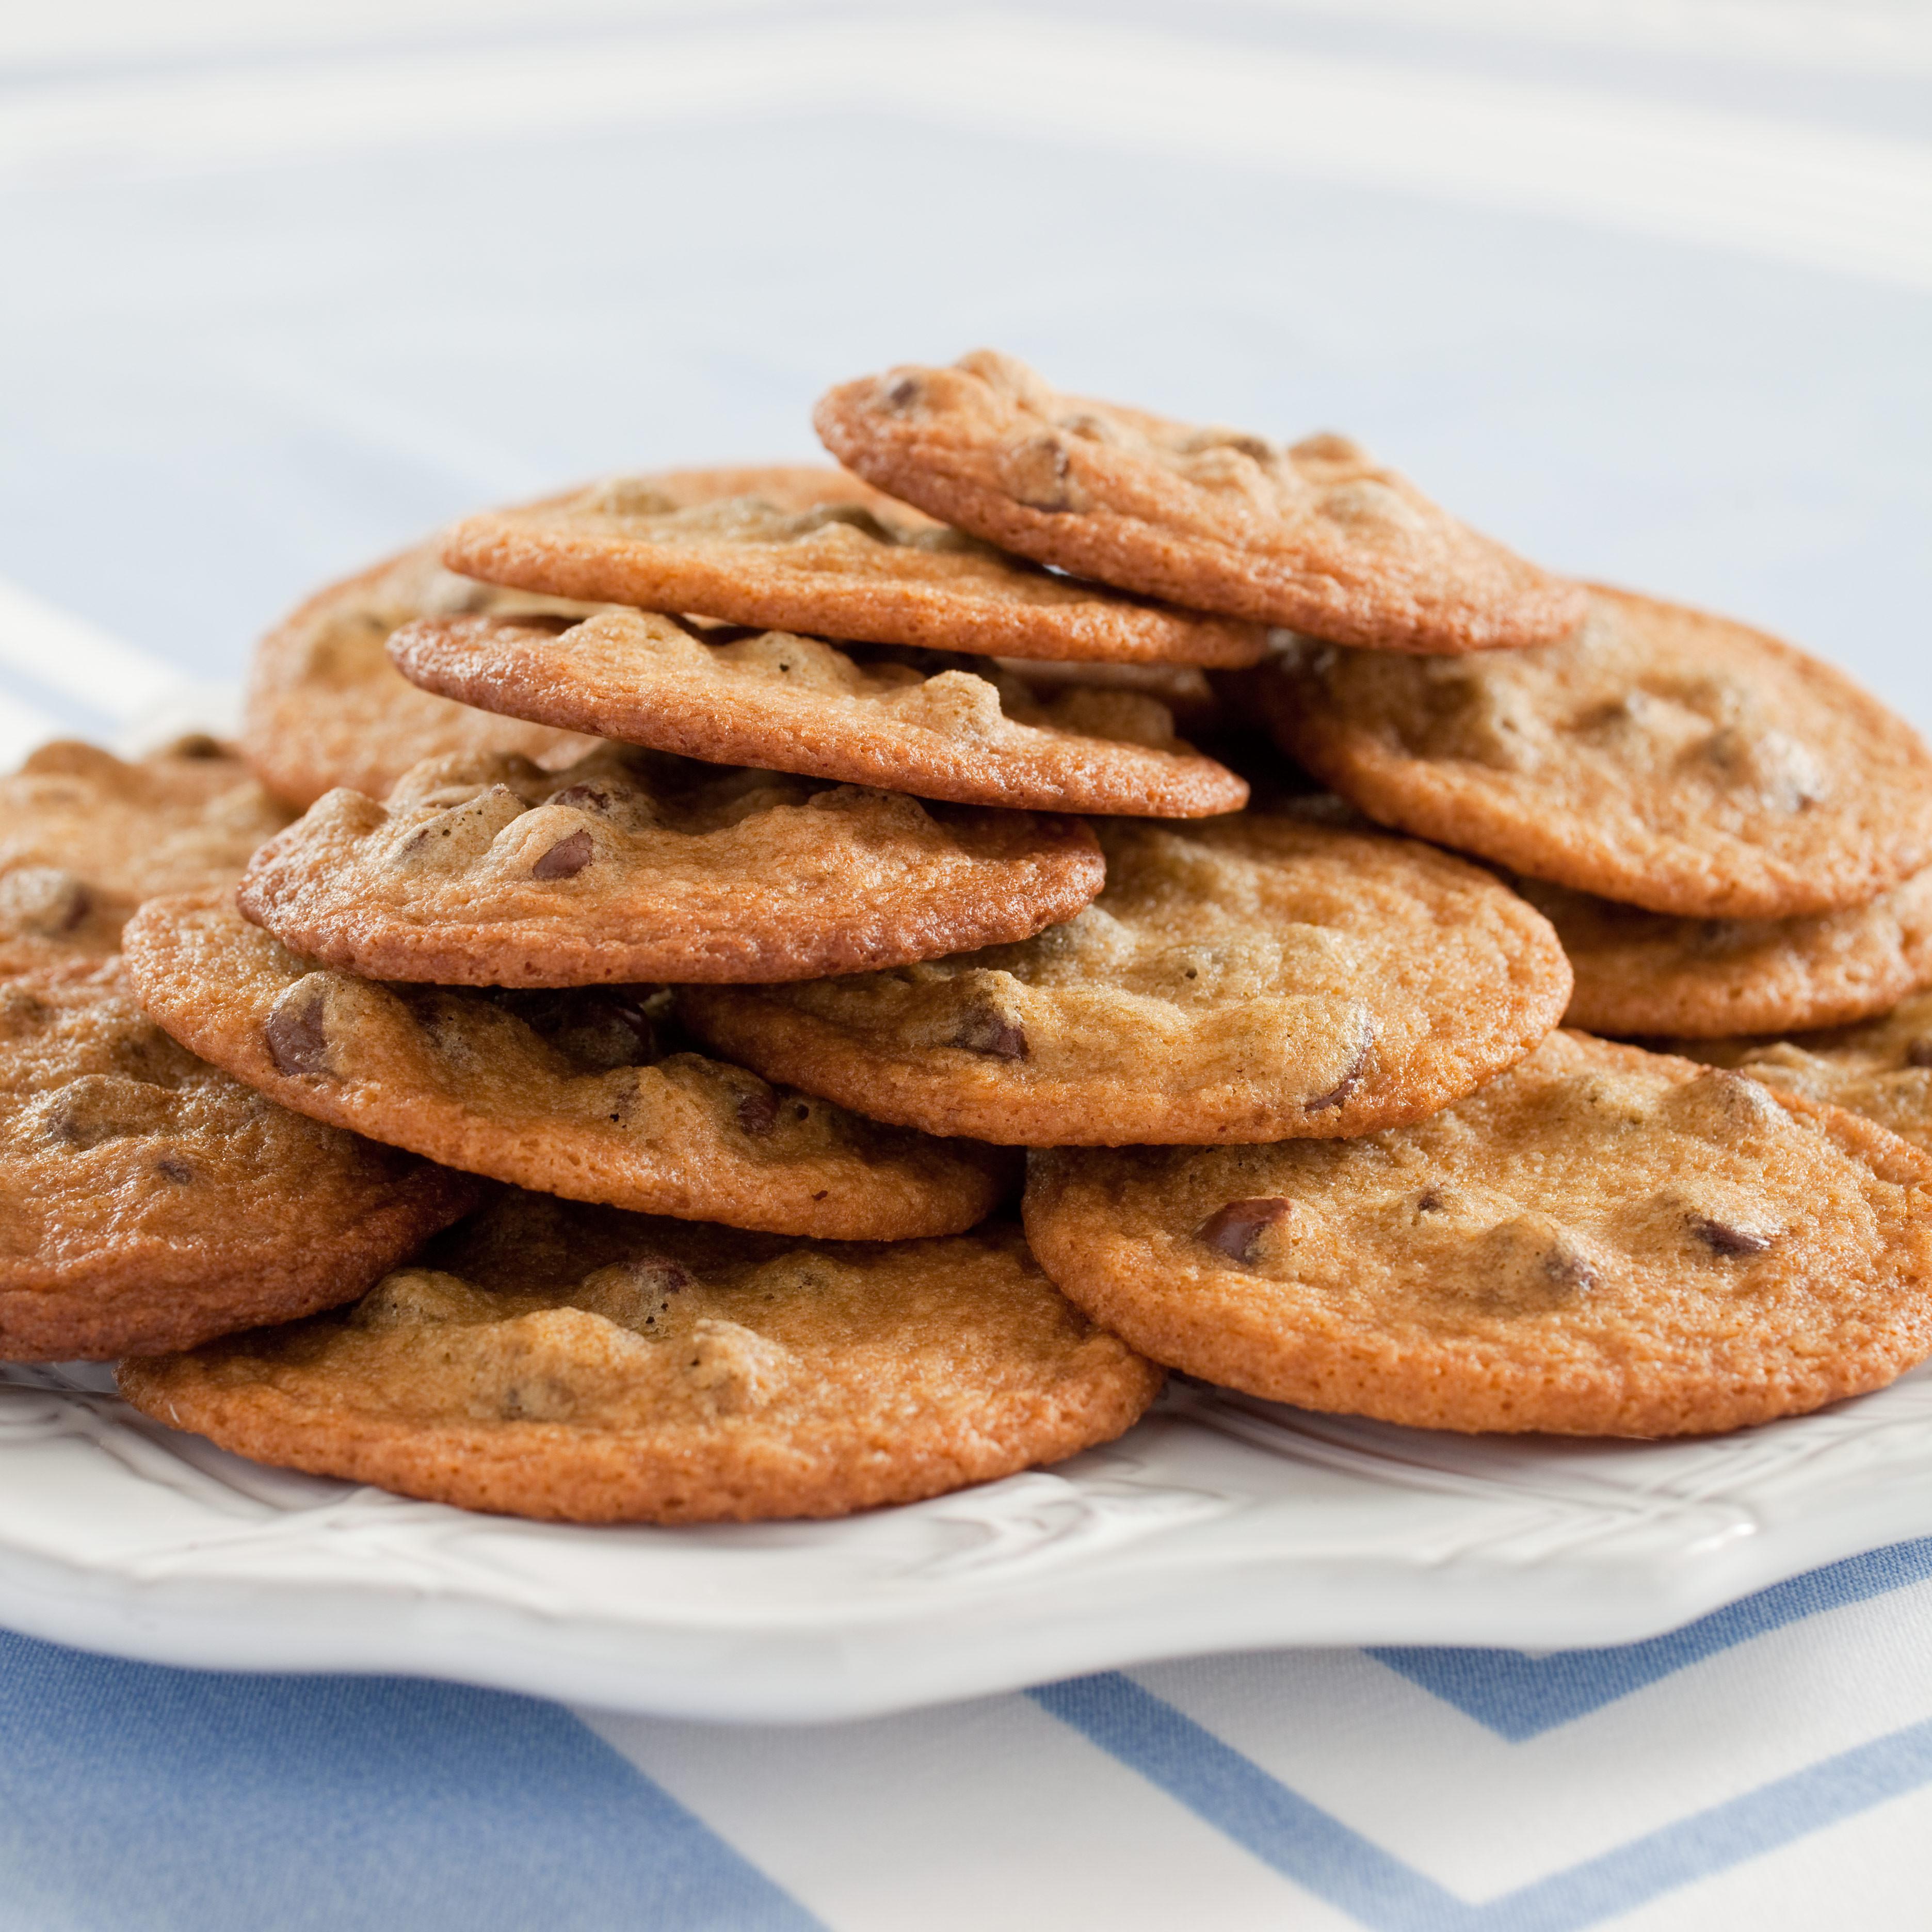 Crispy Chocolate Chip Cookies  Thin Crispy Chocolate Chip Cookies Recipe Cook s